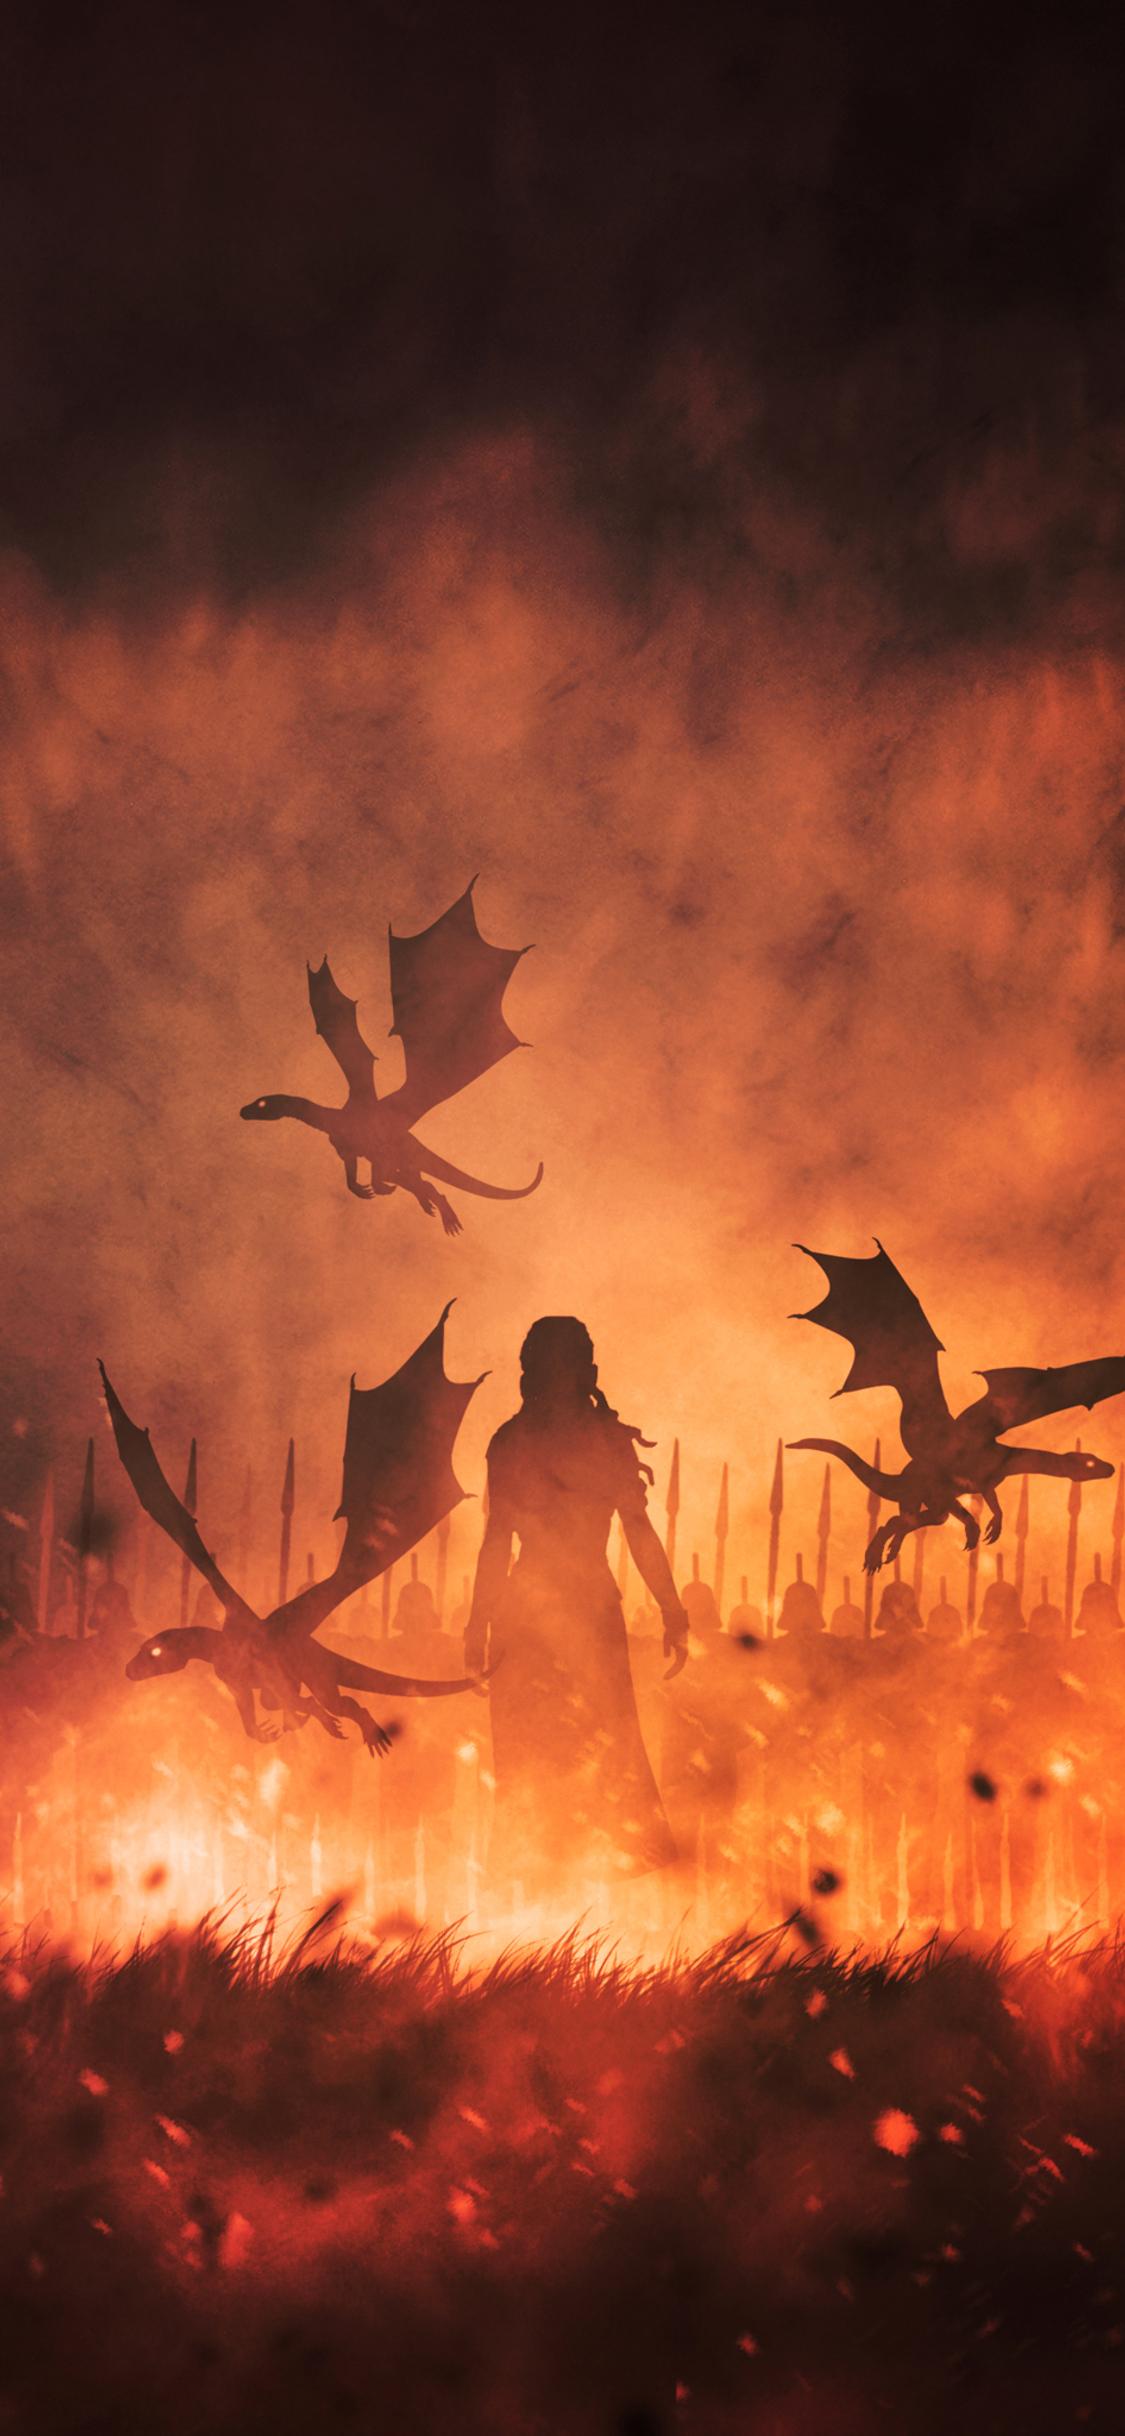 1125x2436 Daenerys Targaryen With Dragons Illustration